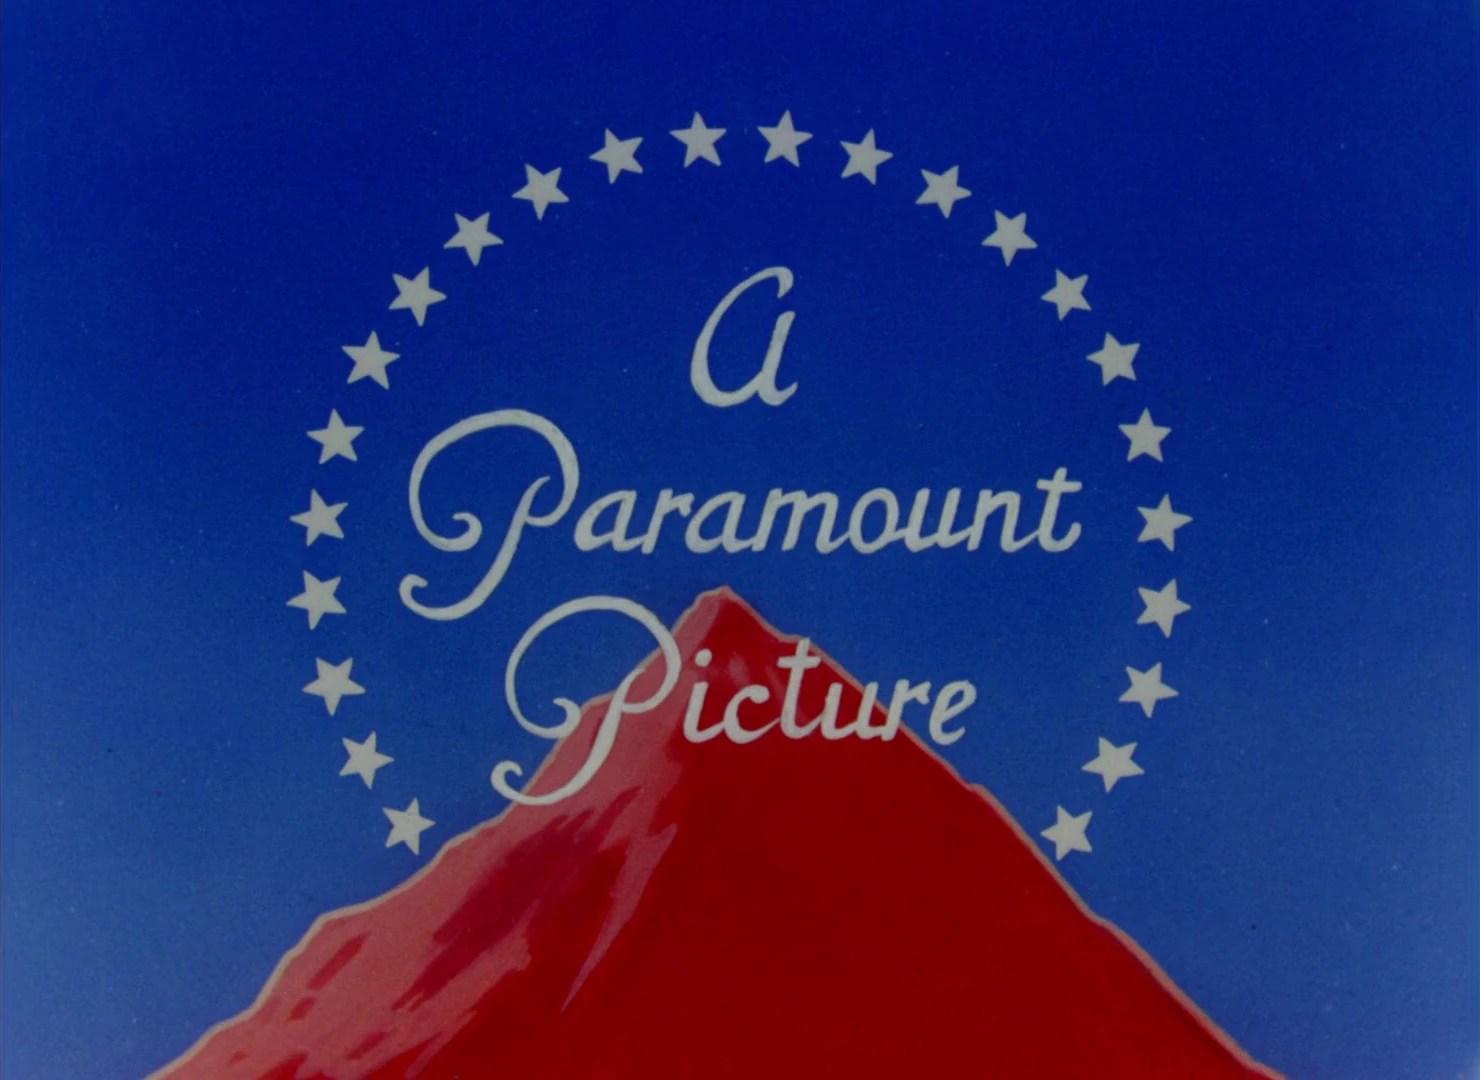 Paramount Cartoon Studios  Logopedia the logo and